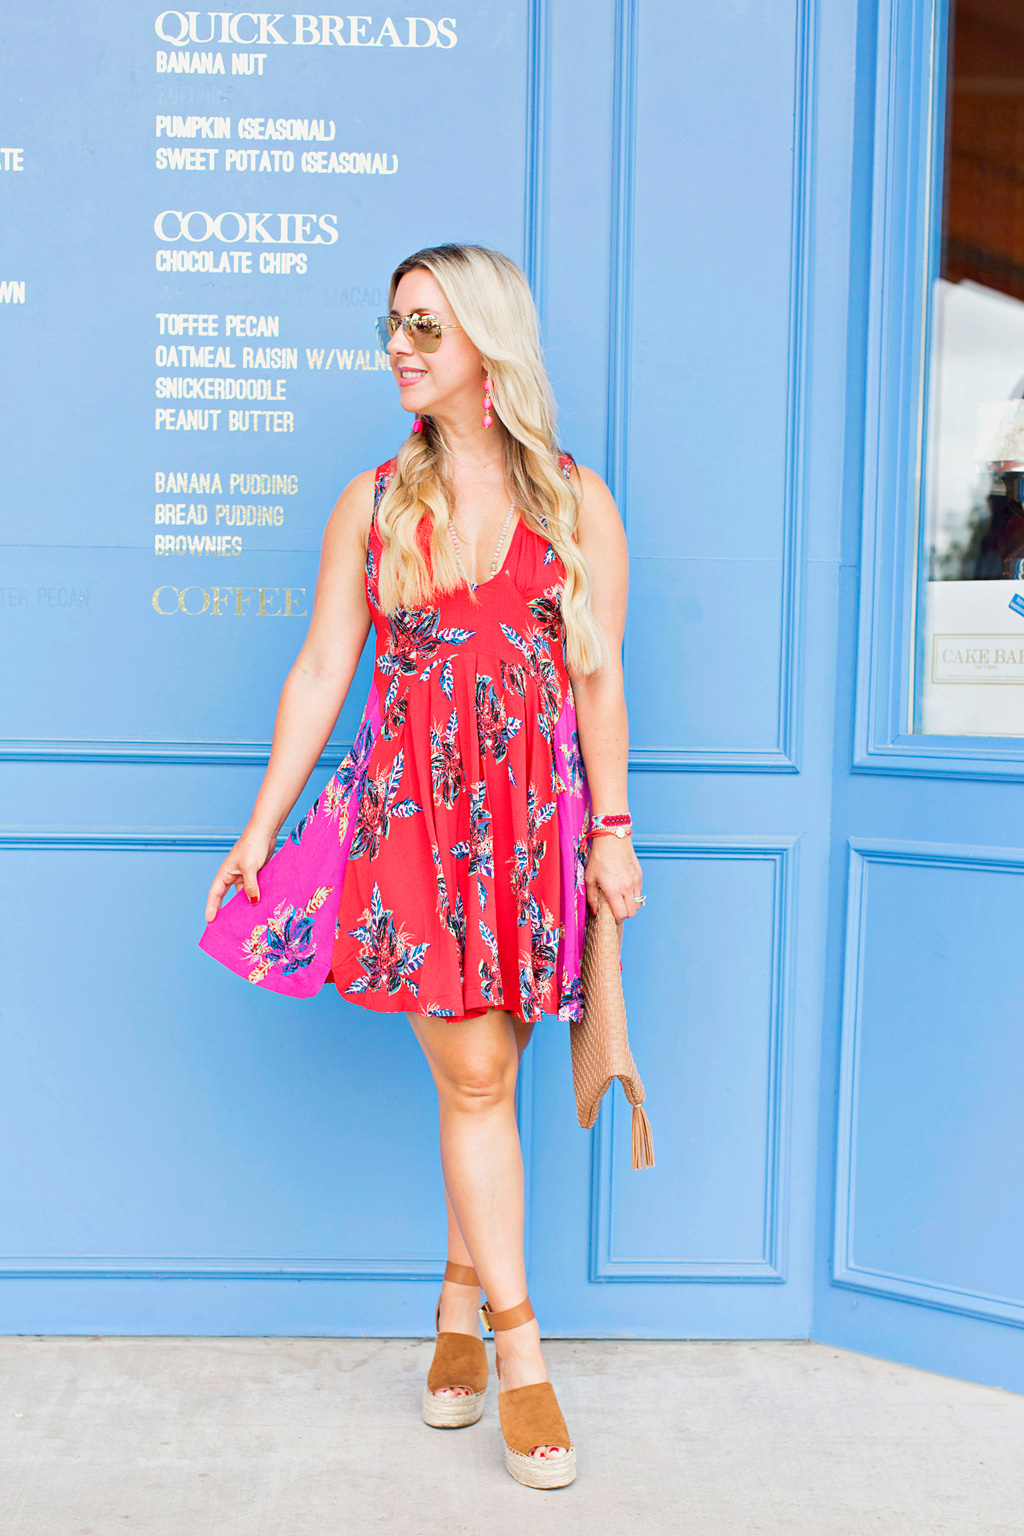 Floral Mini Dress | The Darling Petite Diva | Nicole Kirk | Dallas | Free People